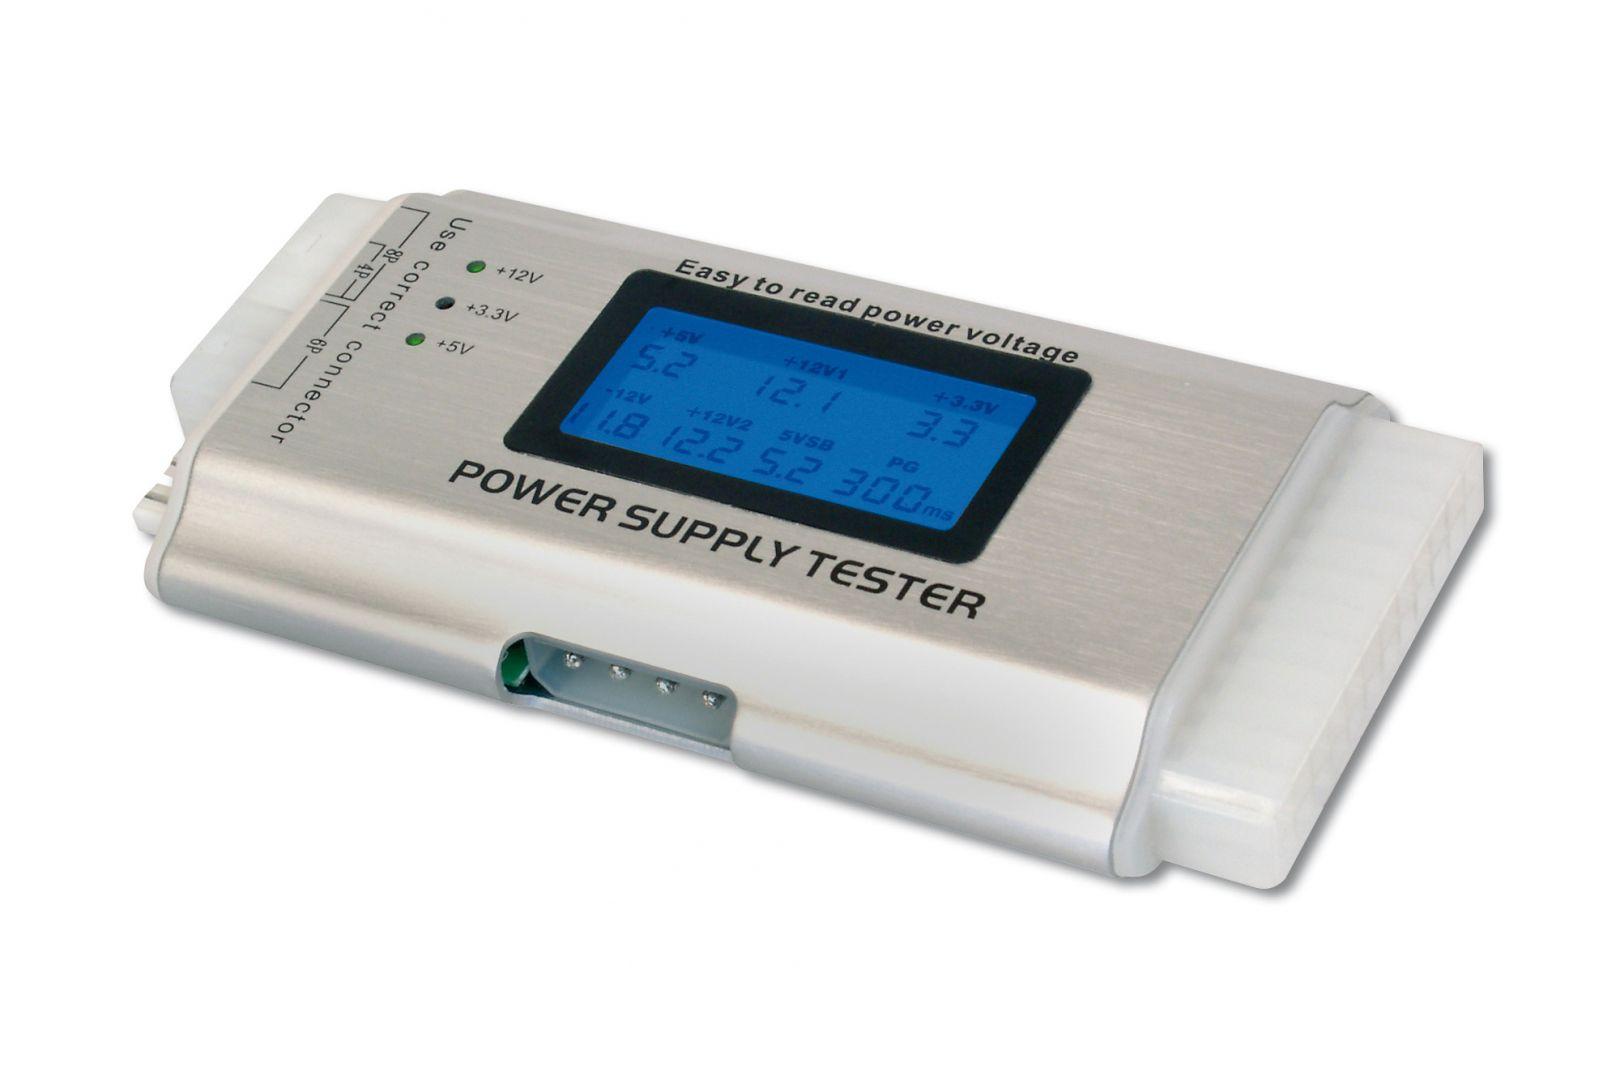 Tápegység Digitus ATX Power Supply Tester with LCD